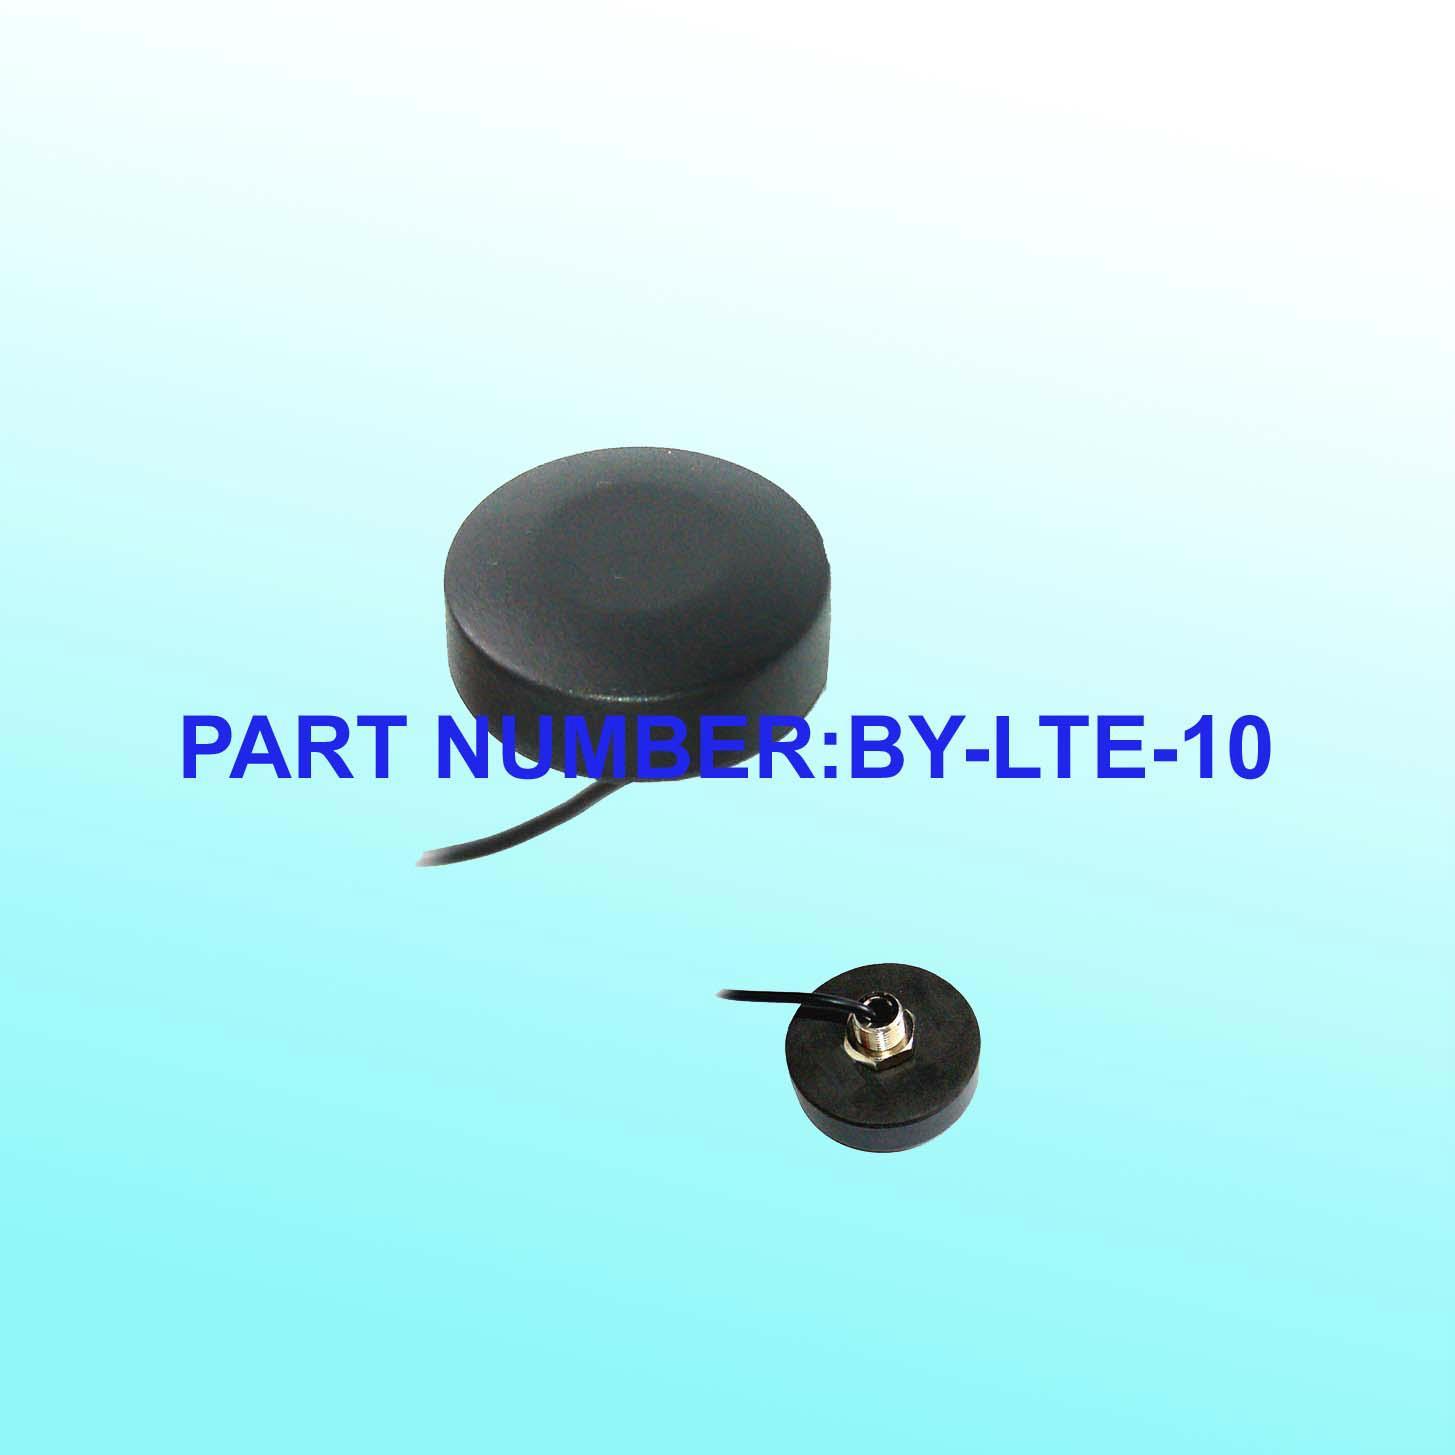 Lte/4G天線螺釘安裝天線 1